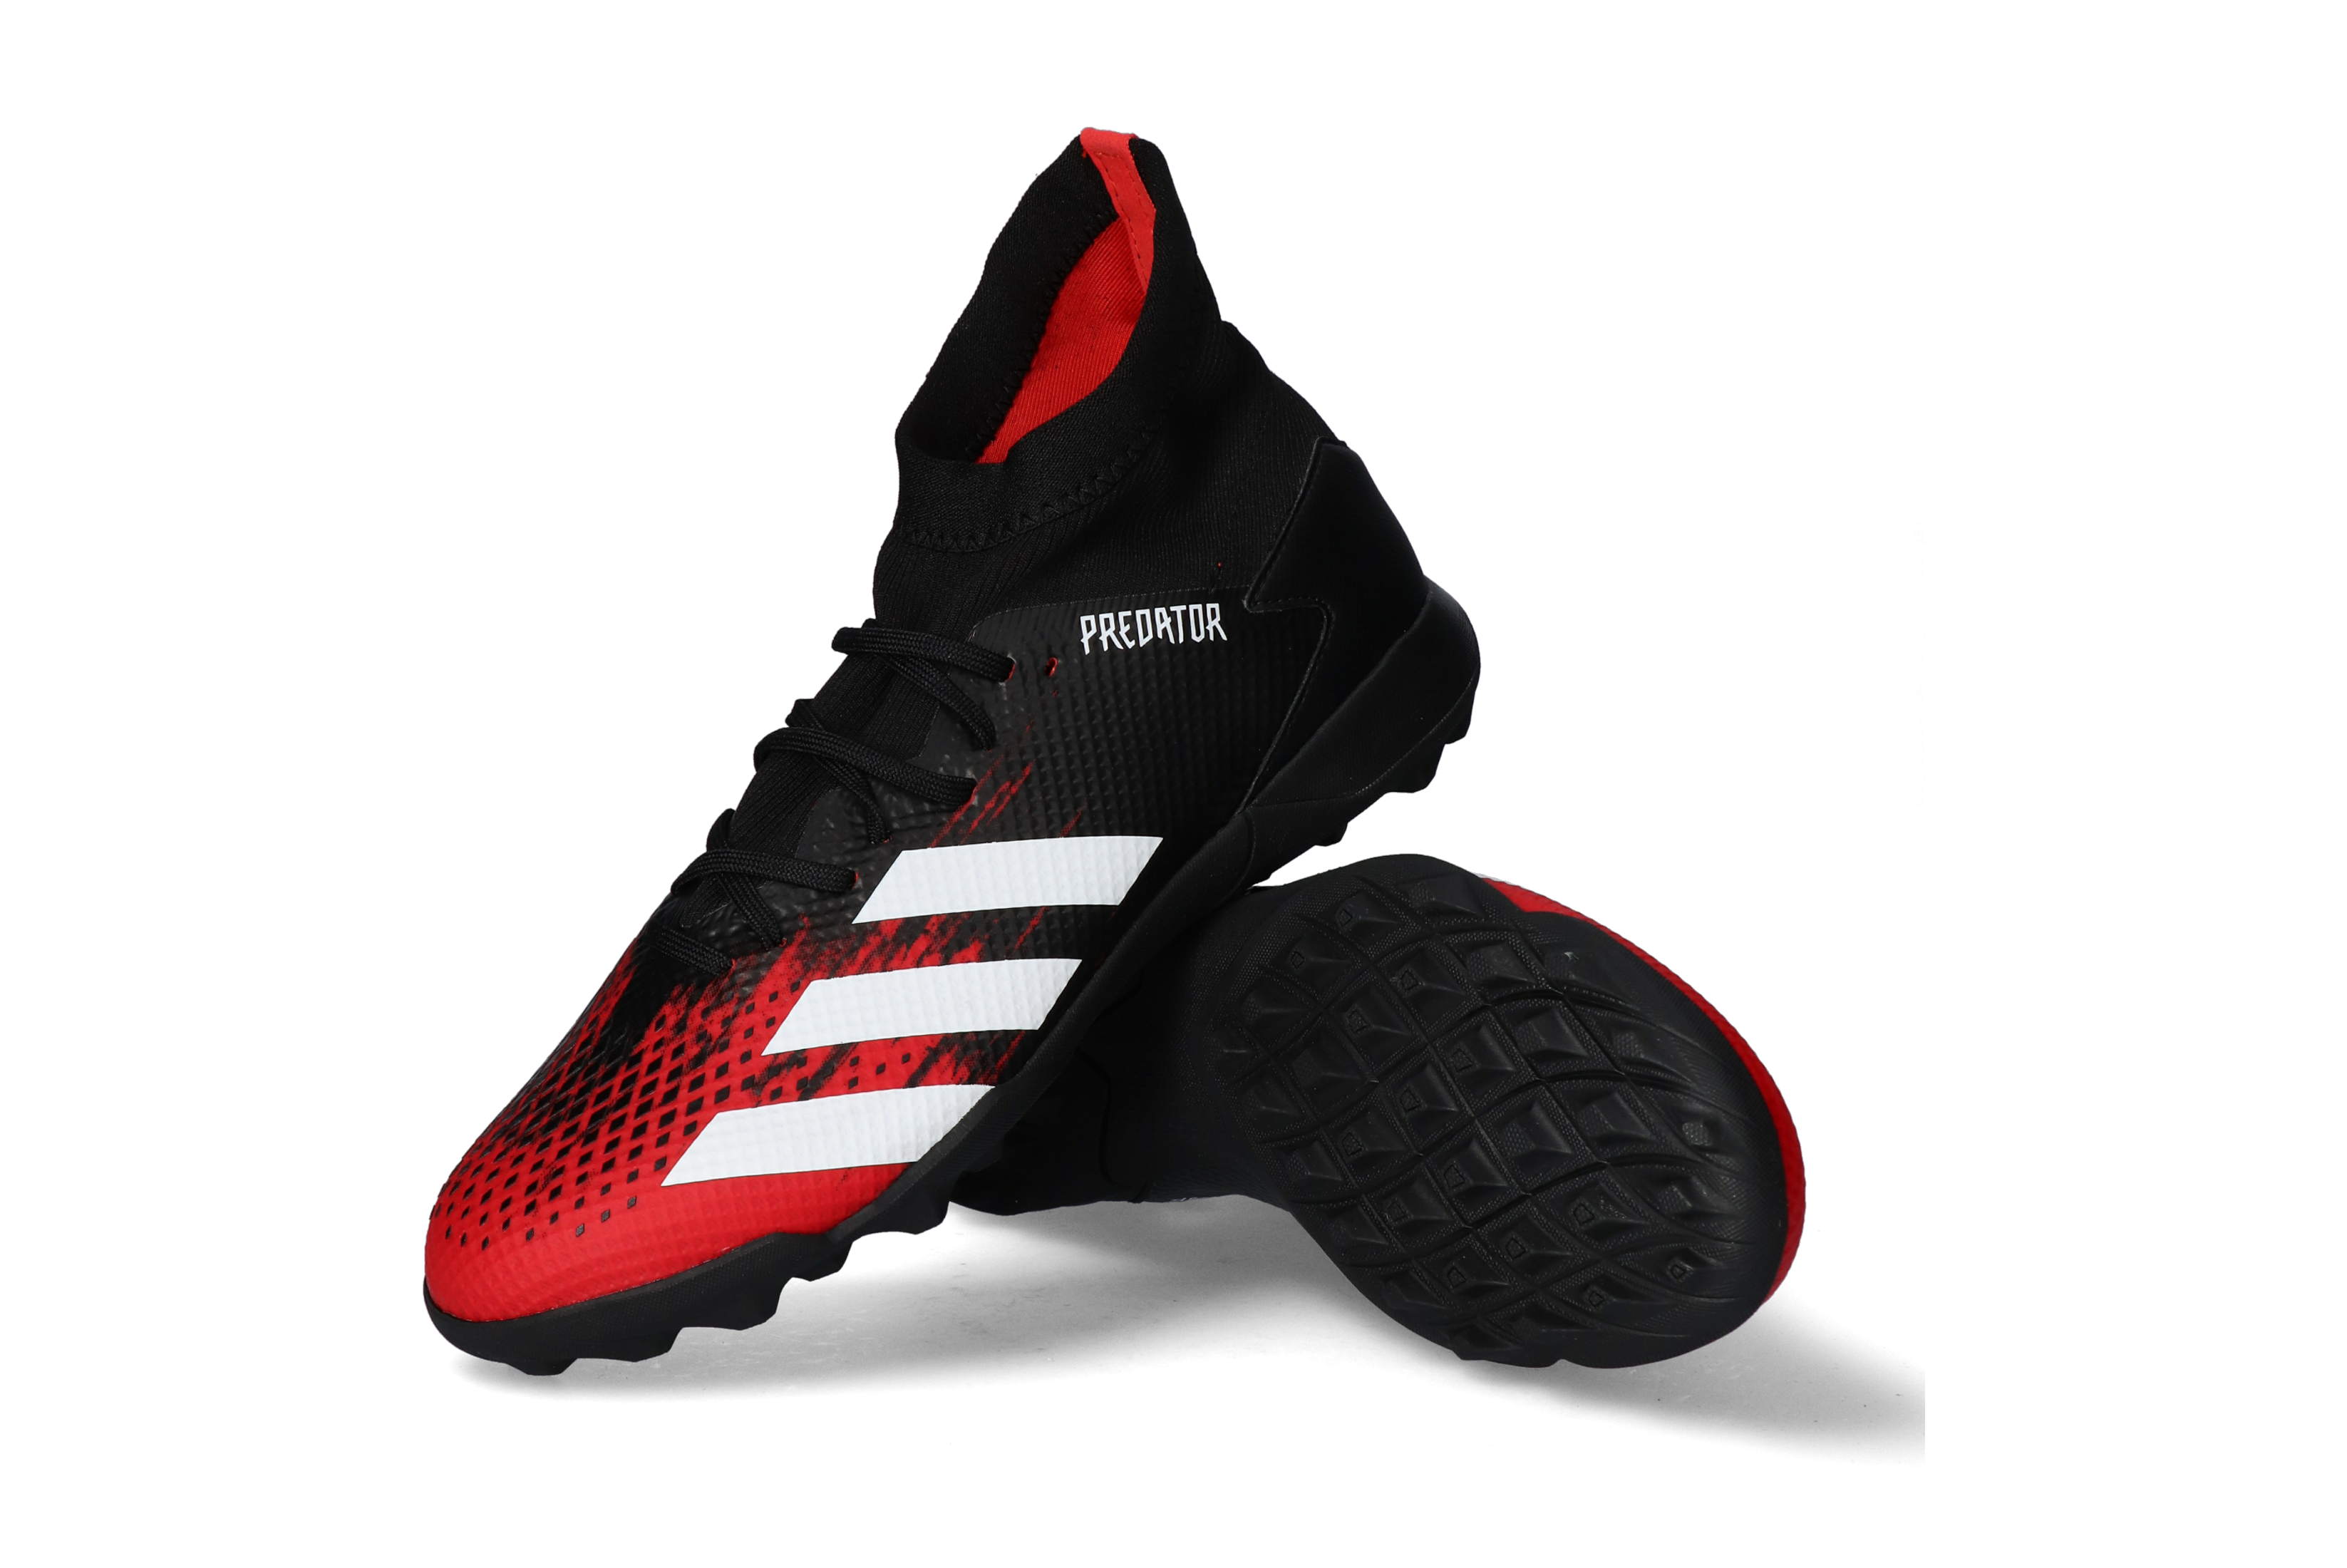 Goalkeeper Glove Review Adidas Predator Pro. YouTube